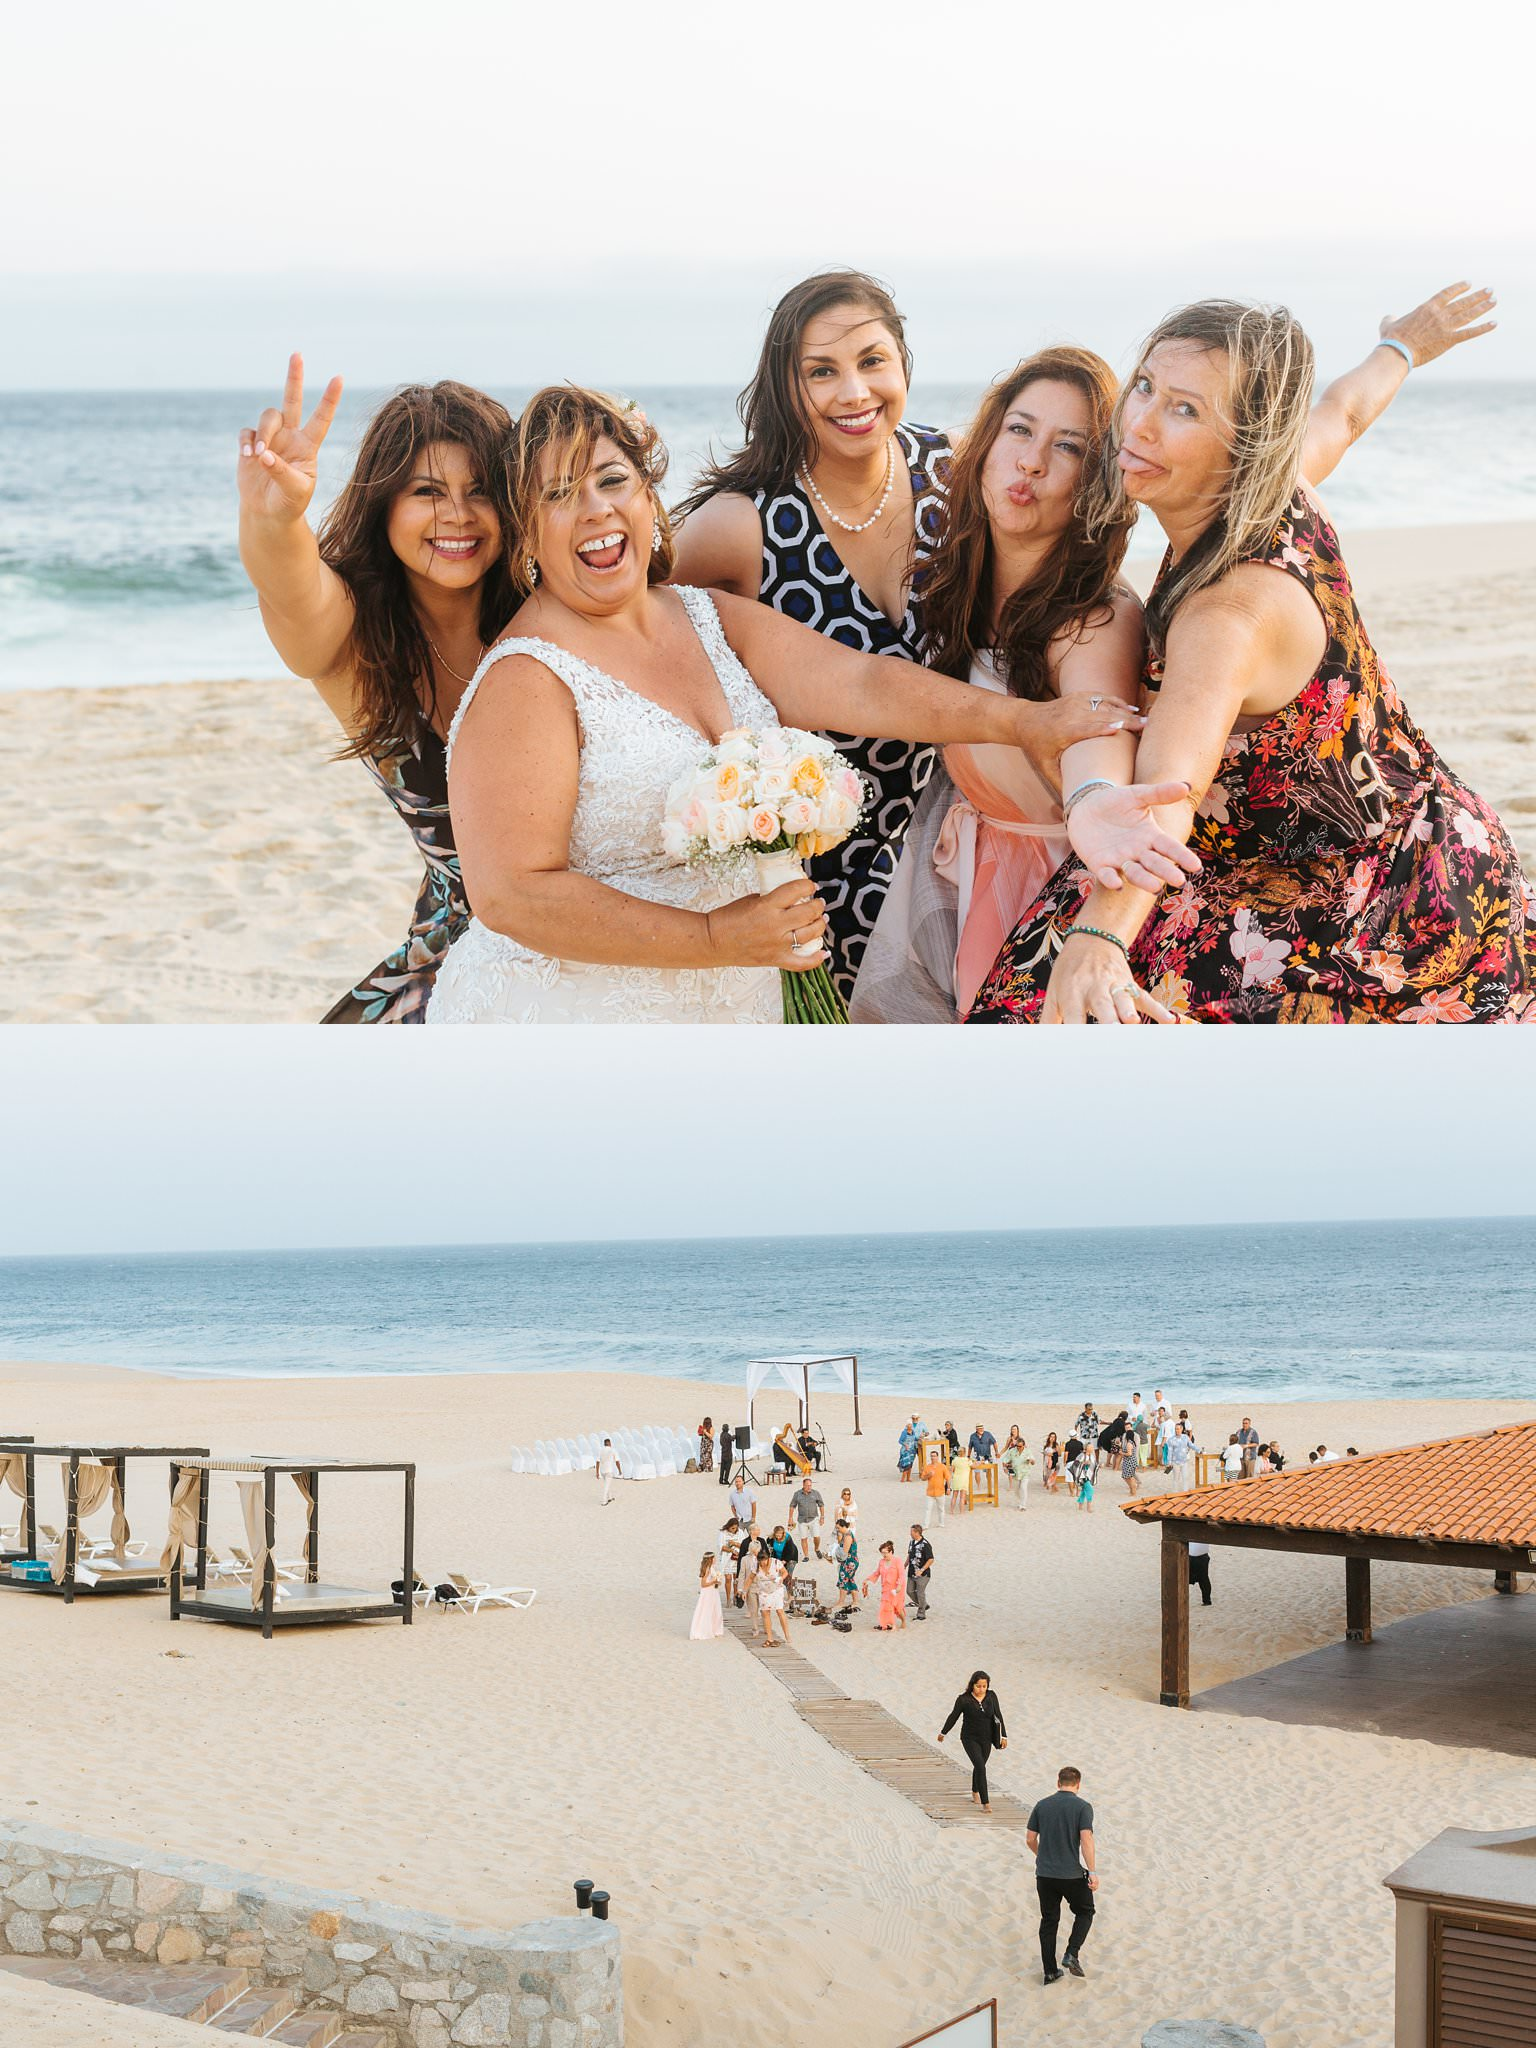 Cabo San Lucas Destination Wedding on the beach - https://brittneyhannonphotography.com